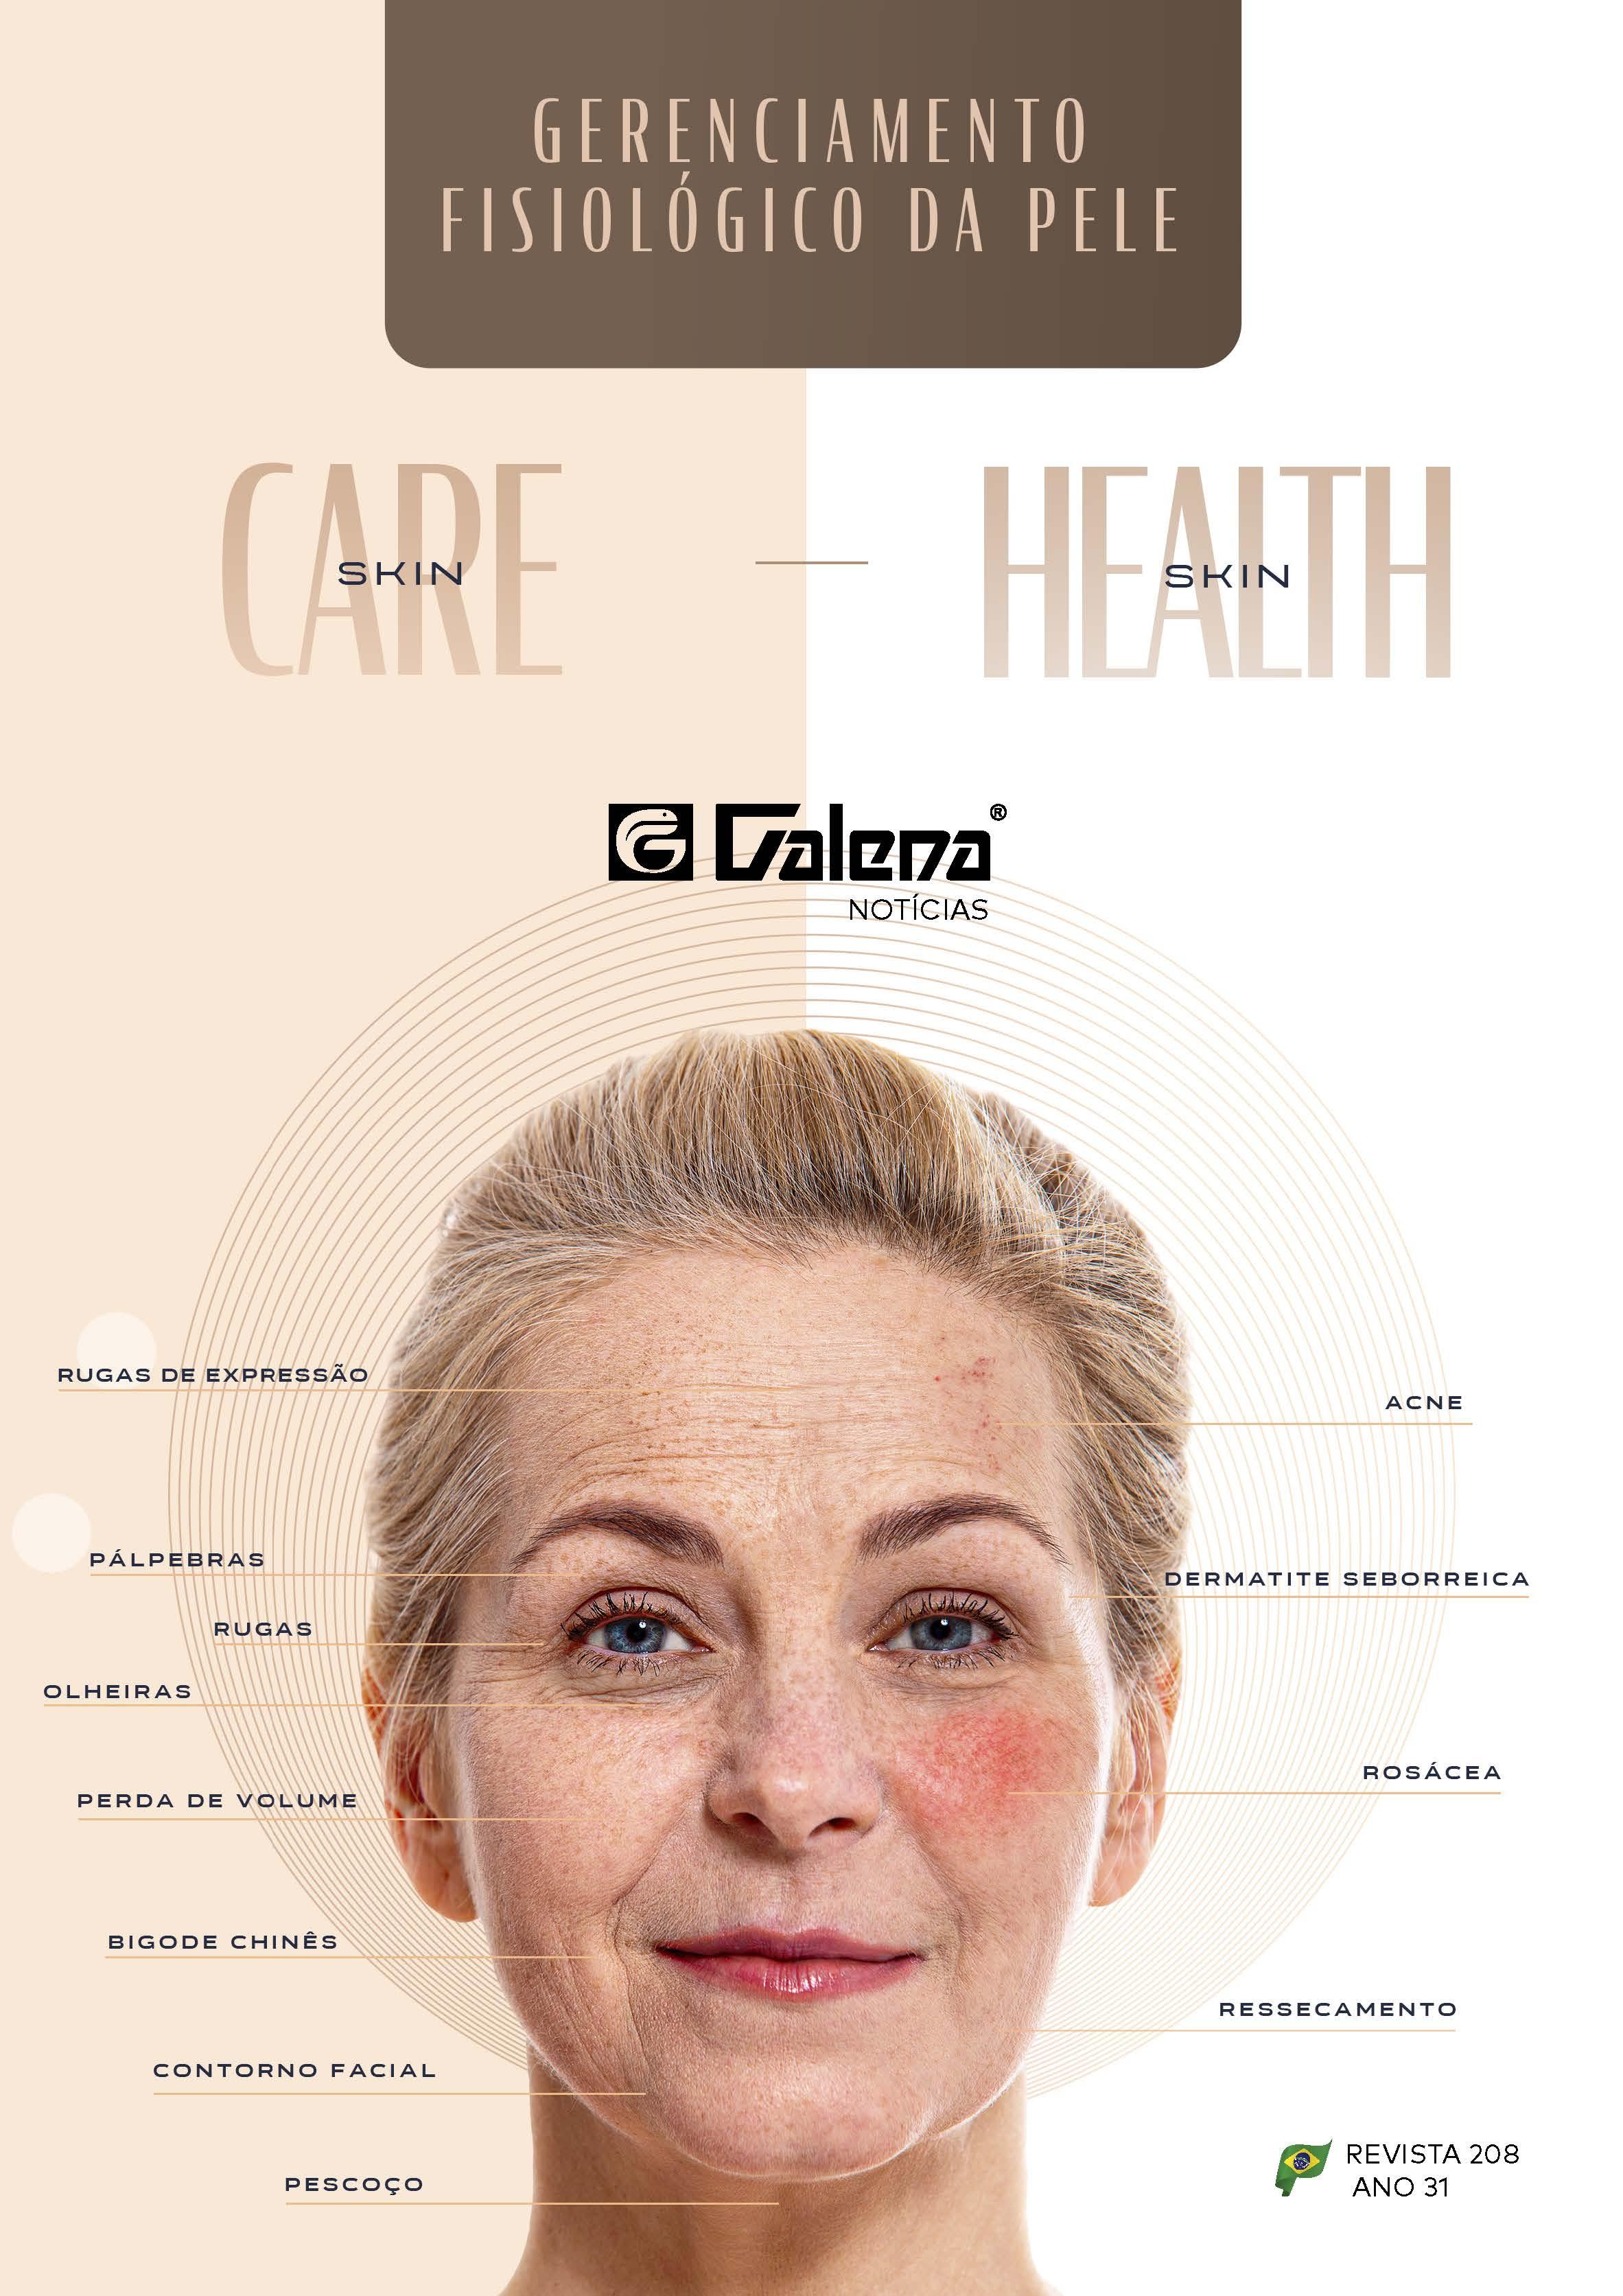 Revista-208-Skin-Health-Skin-Care(digital)_Página_01